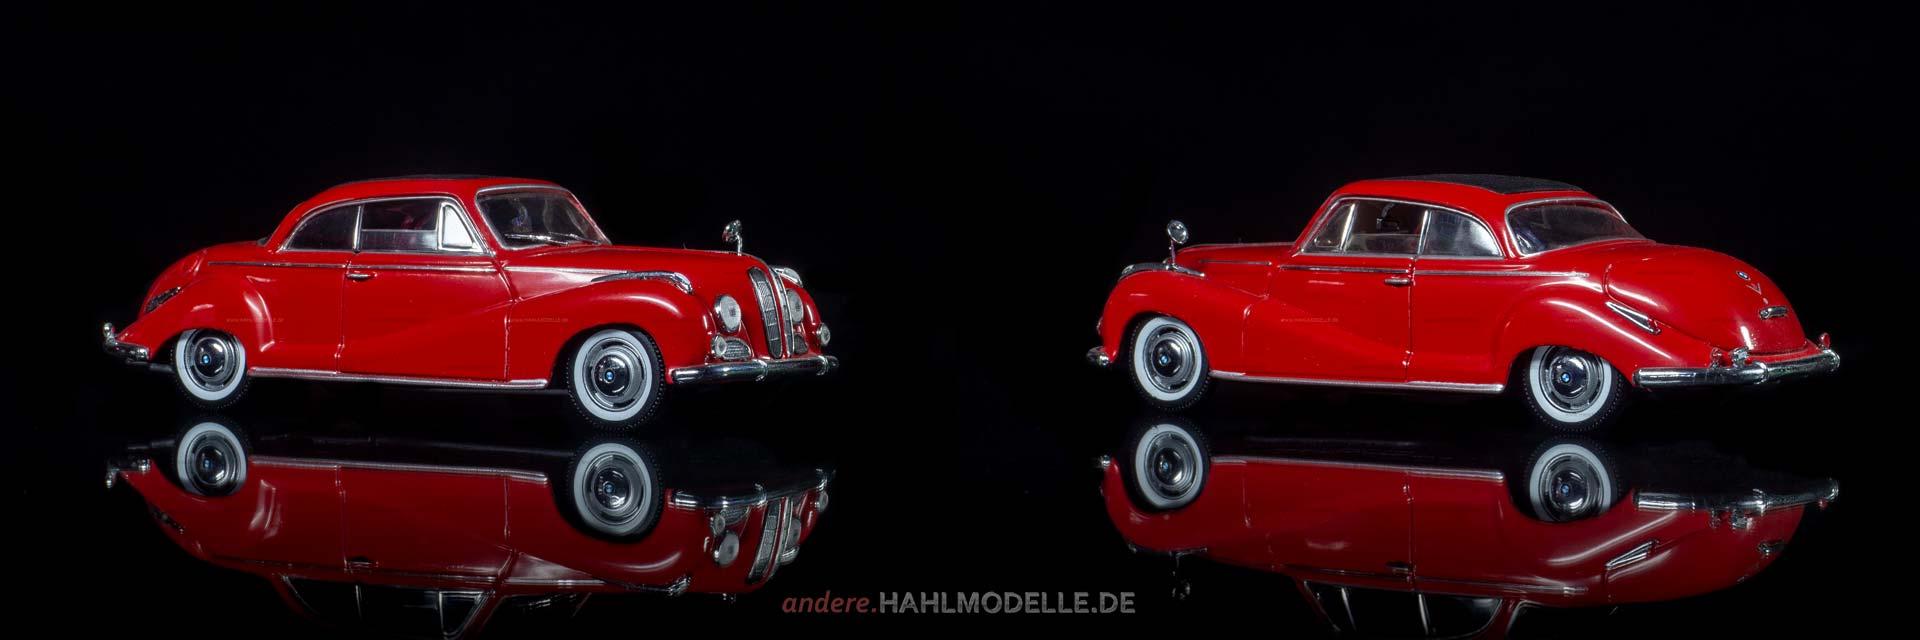 BMW 502 | Coupé | Revell | www.andere.hahlmodelle.de